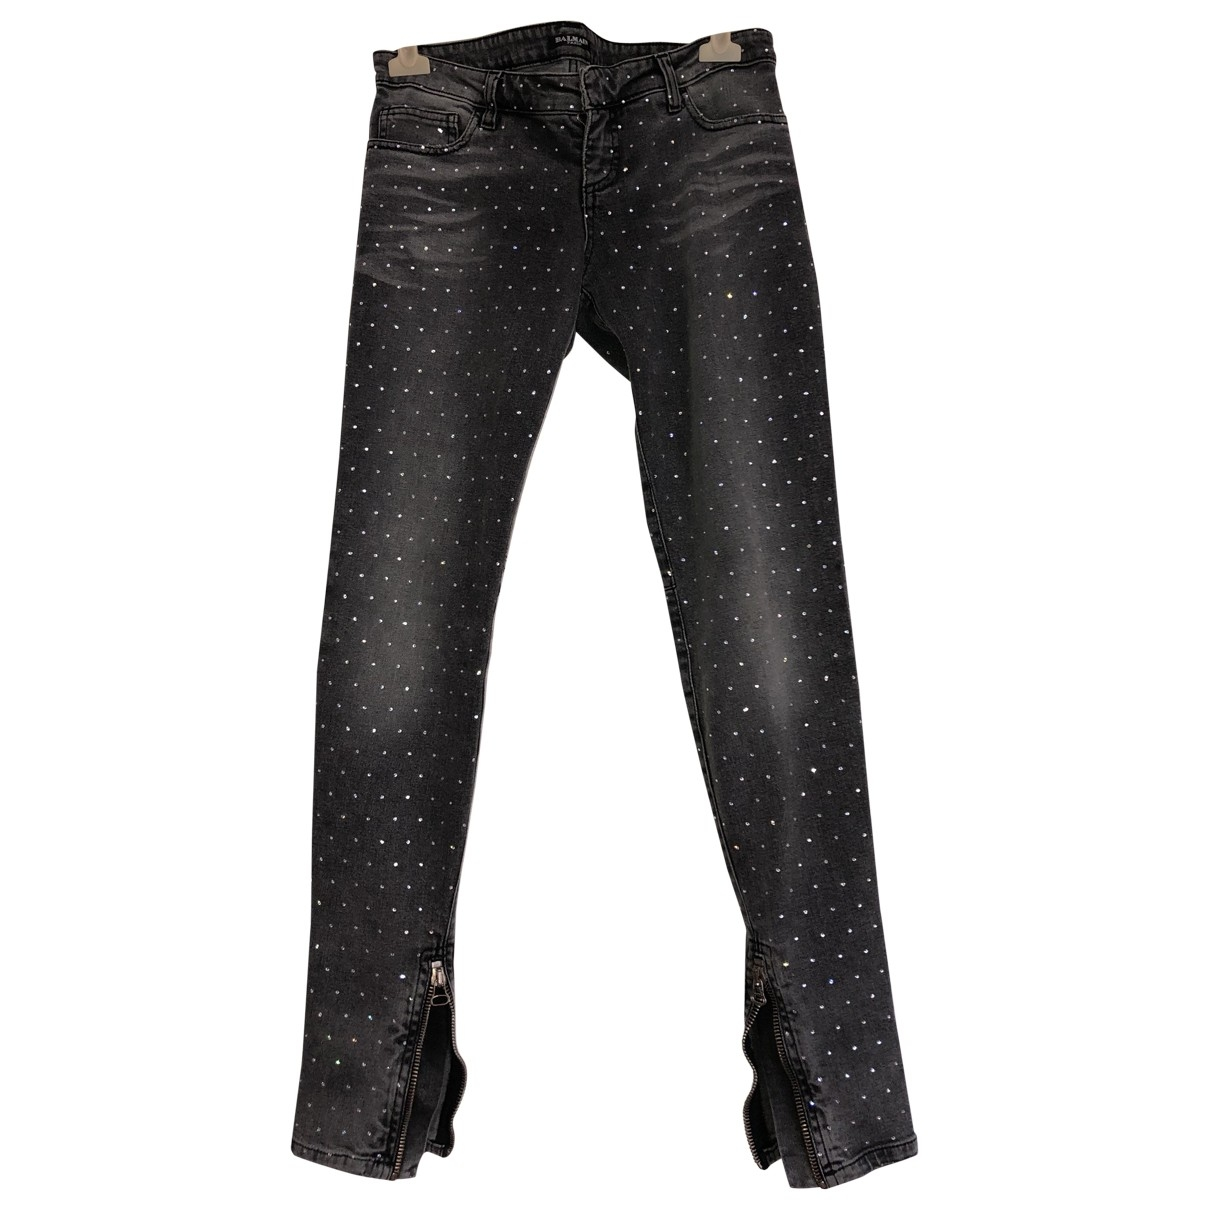 Balmain \N Grey Cotton - elasthane Jeans for Women 40 FR